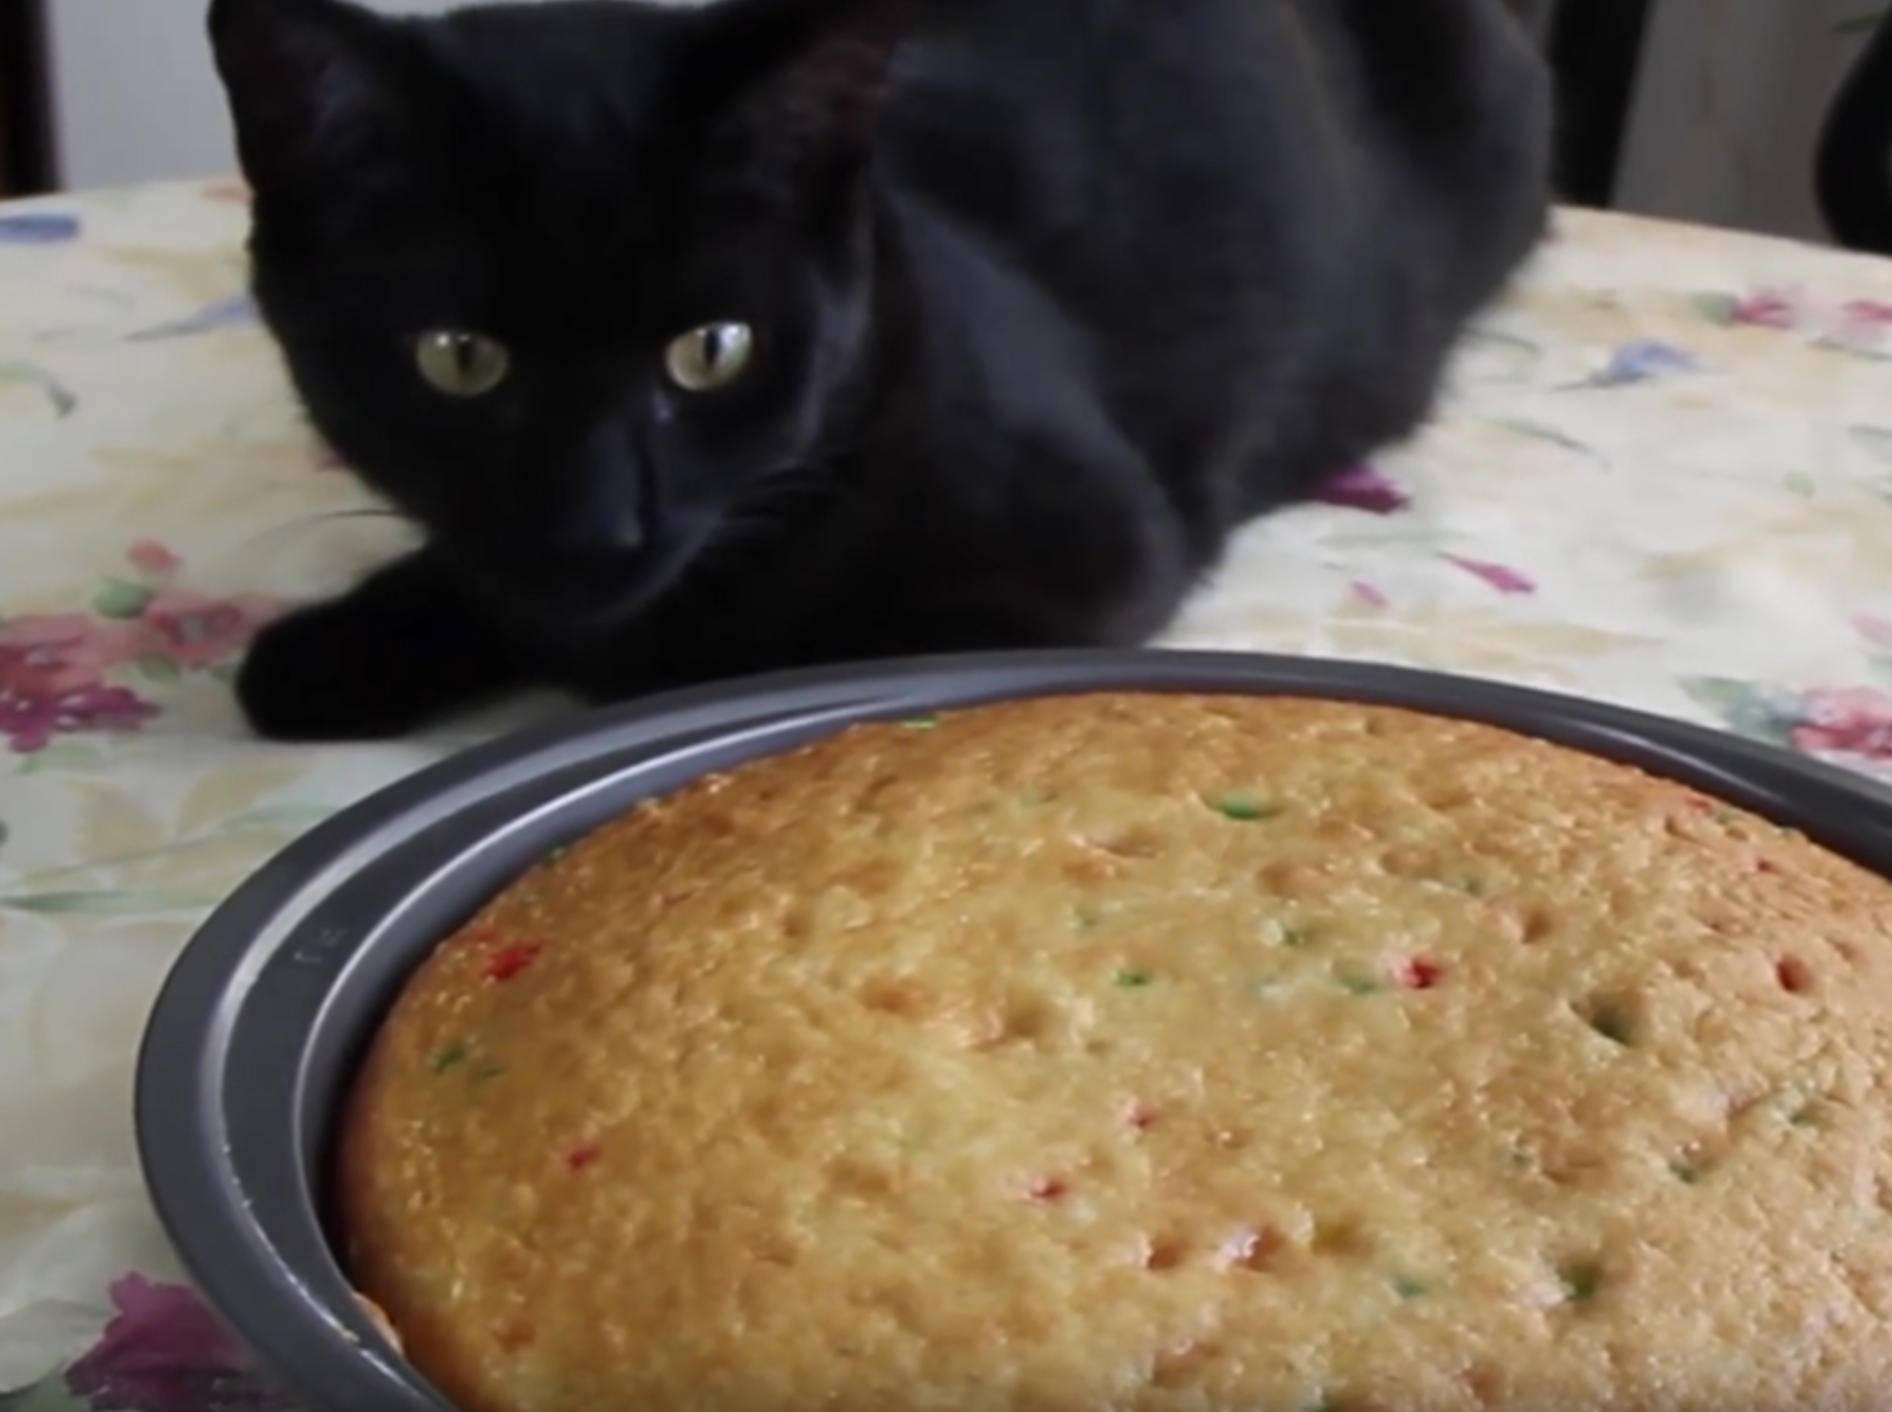 """Nimm das, du süßes Gebäck!"": Katze ruiniert Kuchen – YouTube / Kitty Cat Bliss"